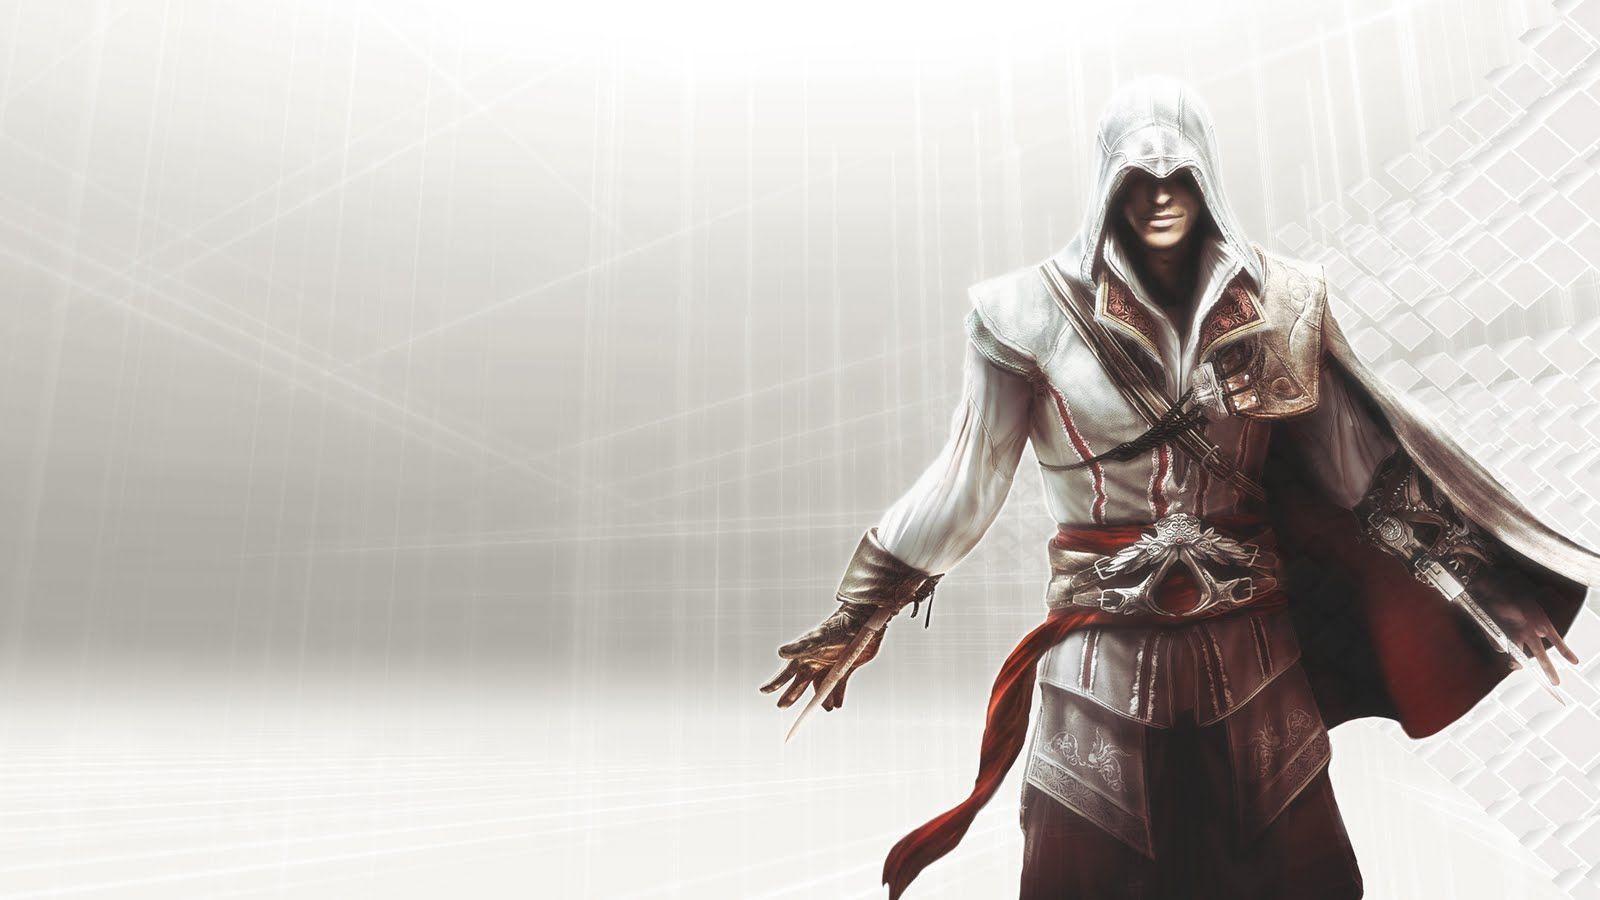 Assassins Creed Wallpaper 1080p: Assassin's Creed 2 Wallpapers